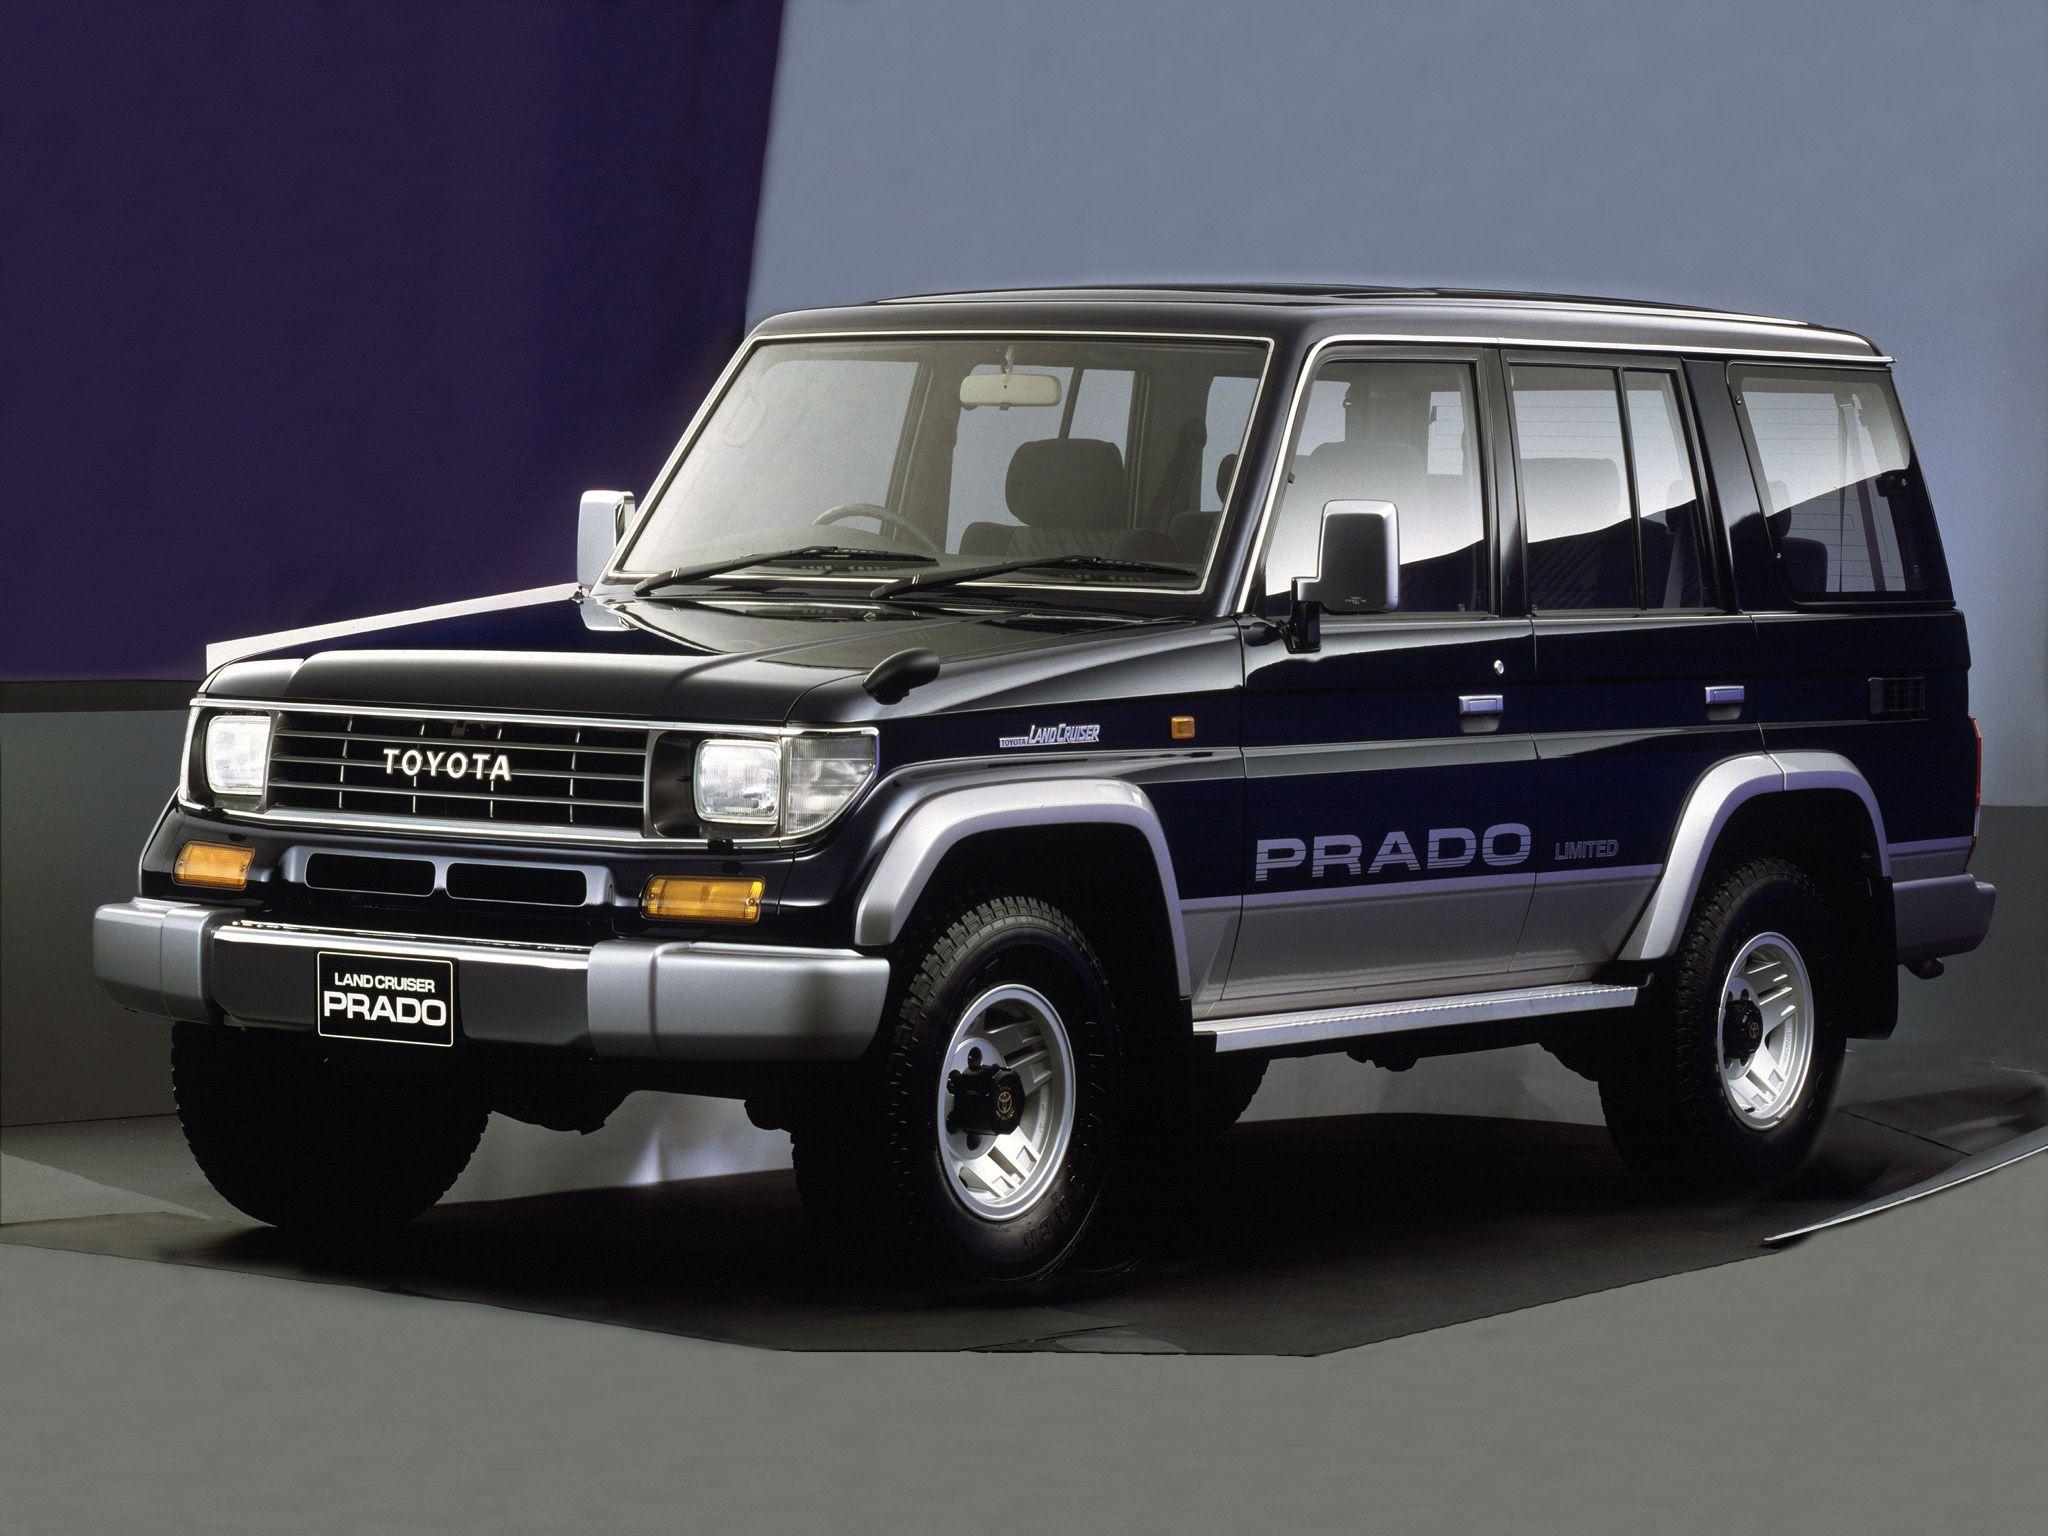 Toyota land cruiser prado memorial package kzj78w